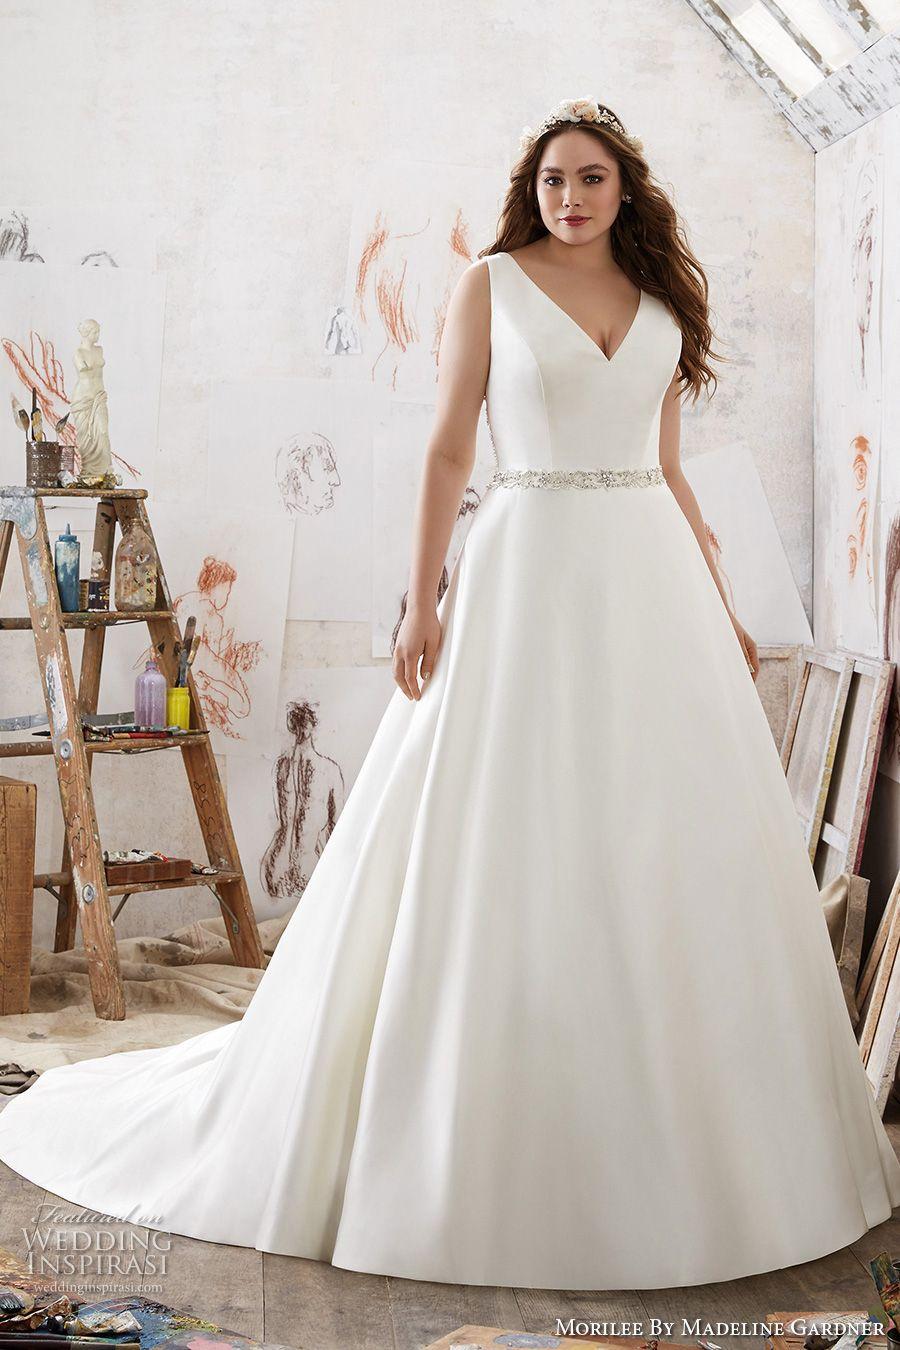 Morilee By Madeline Gardner Spring 2017 Wedding Dresses Julietta Plus Size Bridal Collection Wedding Inspirasi Wedding Dresses Taffeta Wedding Dresses Satin Wedding Dress Styles [ jpg ]